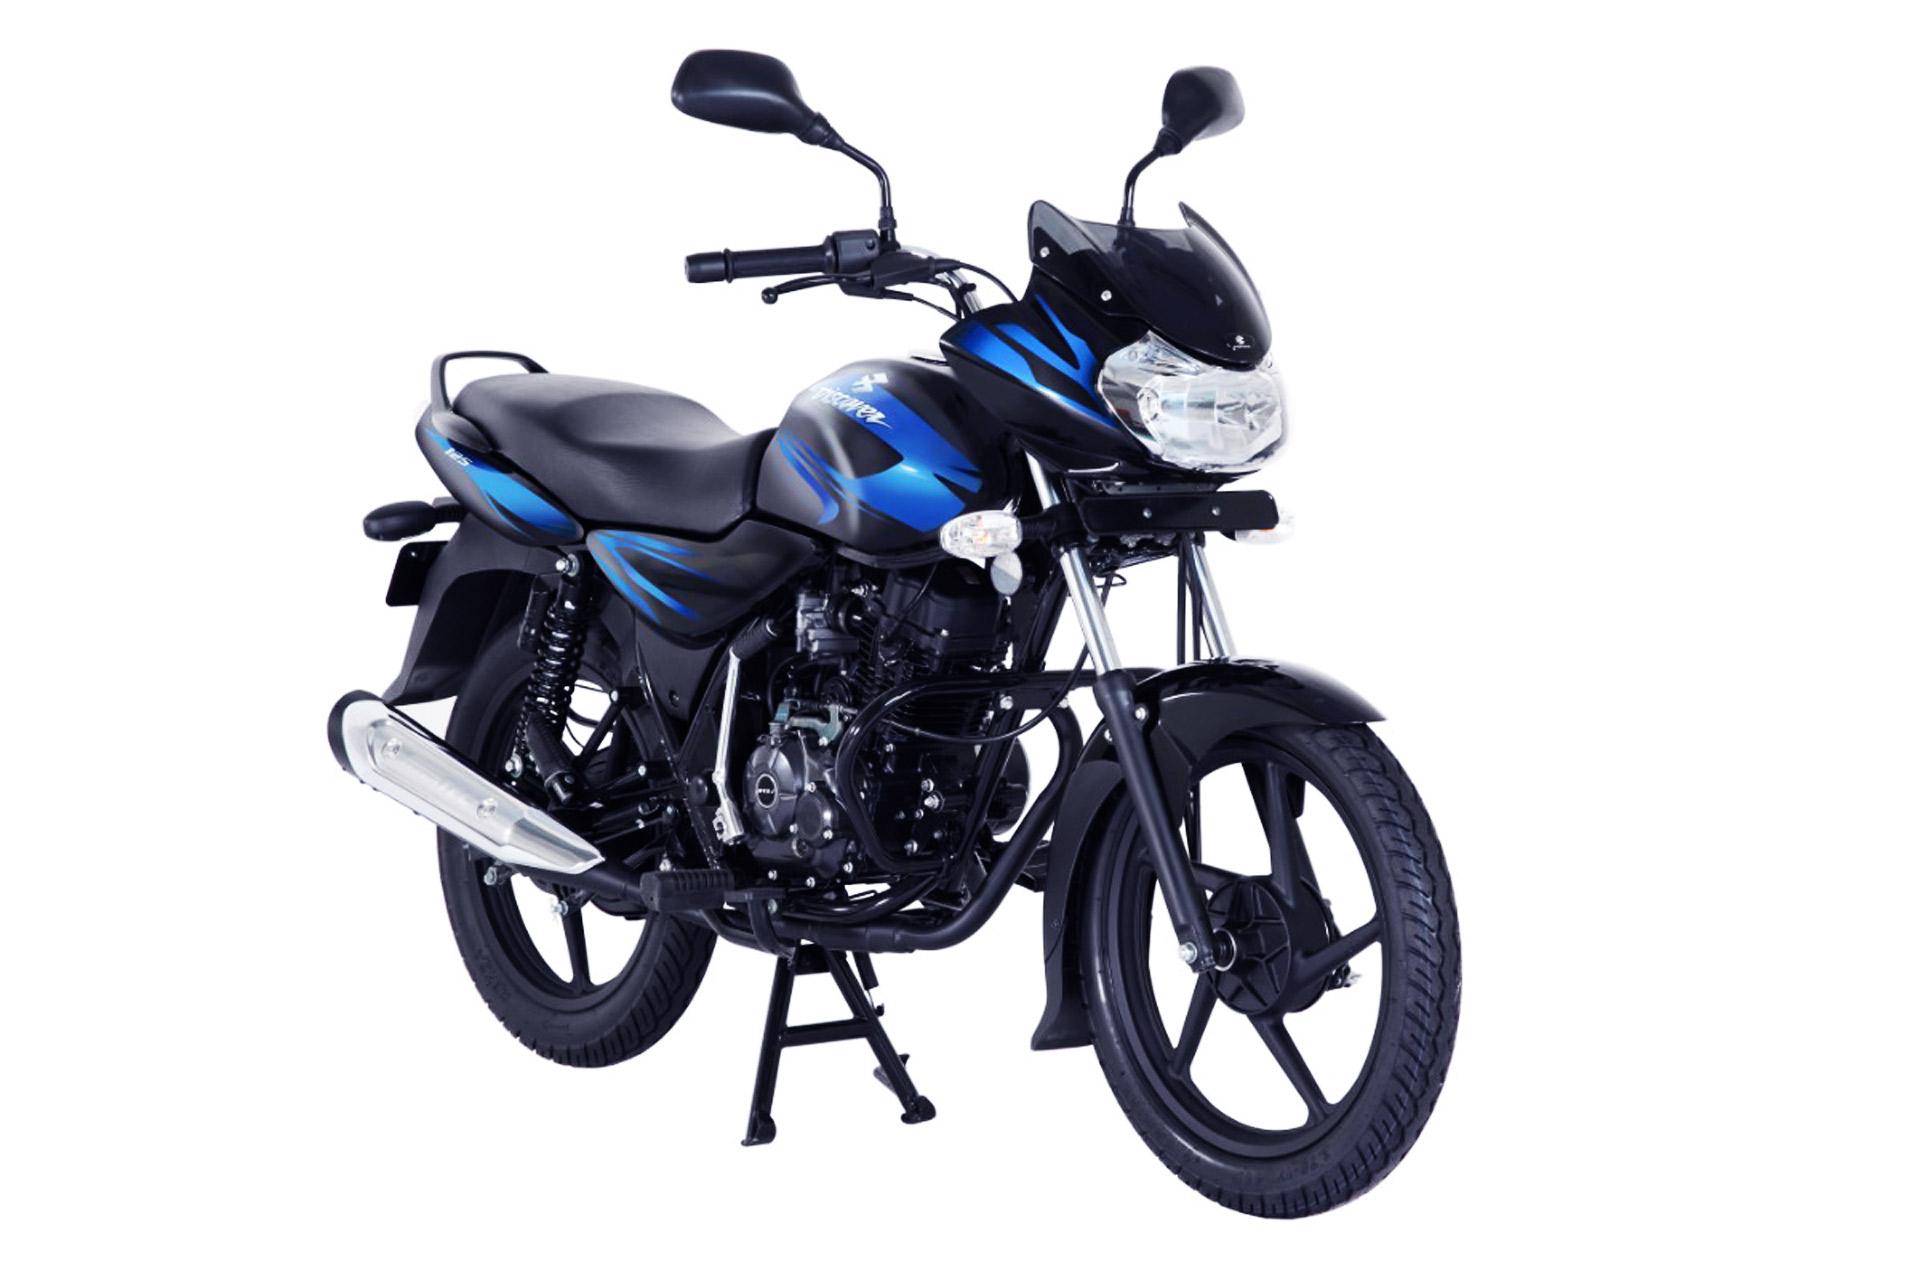 Bajaj Discover 125 Motorcycle Specification